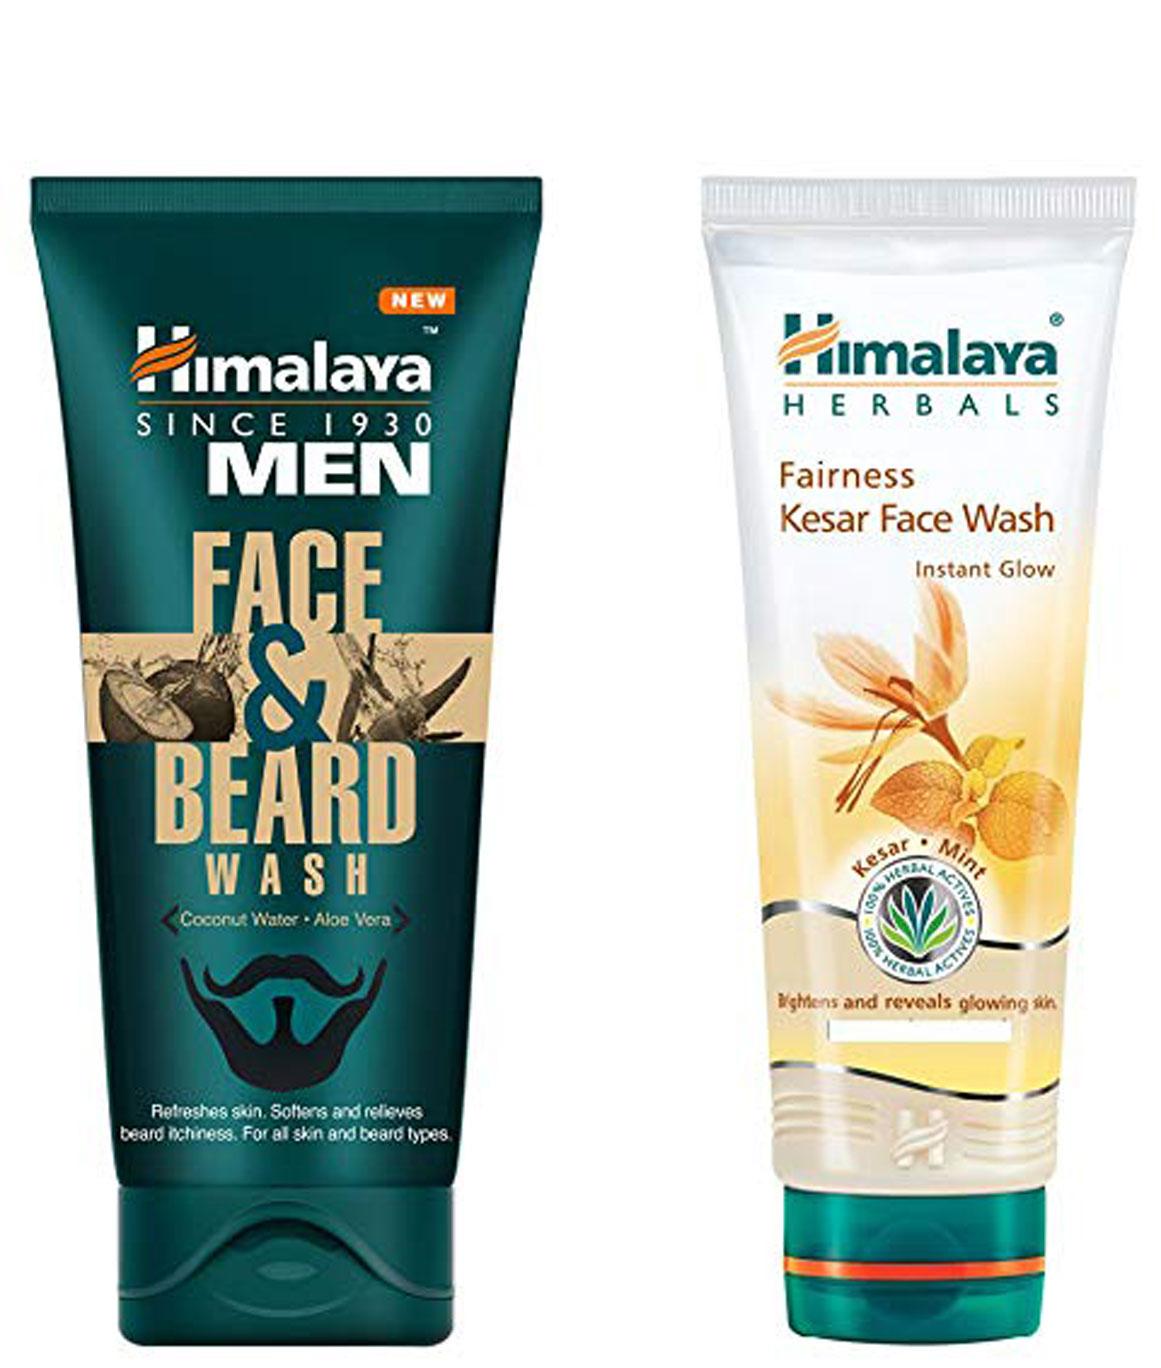 Himalaya Men Face And Beard Wash 80ml and Himalaya Fairness Kesar Face Wash 150ml